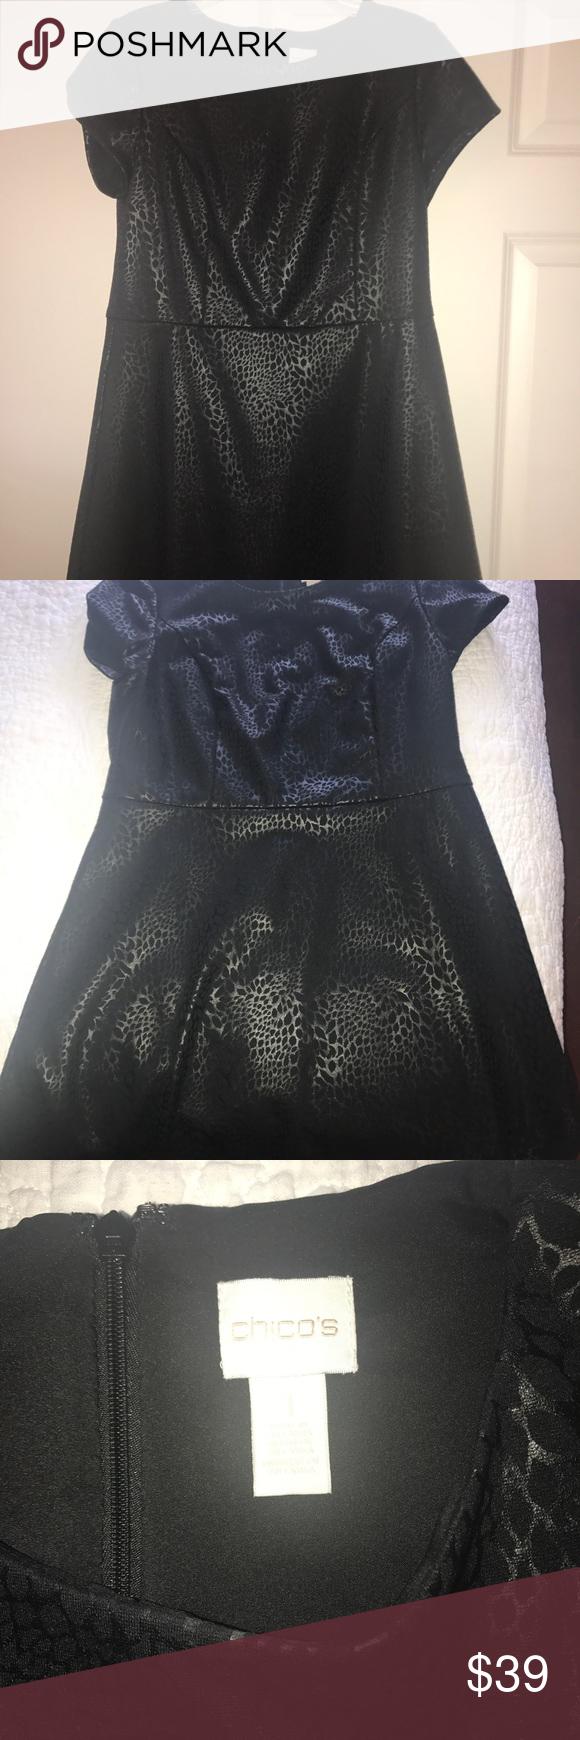 3f9c1f00938 Black dress Stunning black in black cheetah print short sleeve